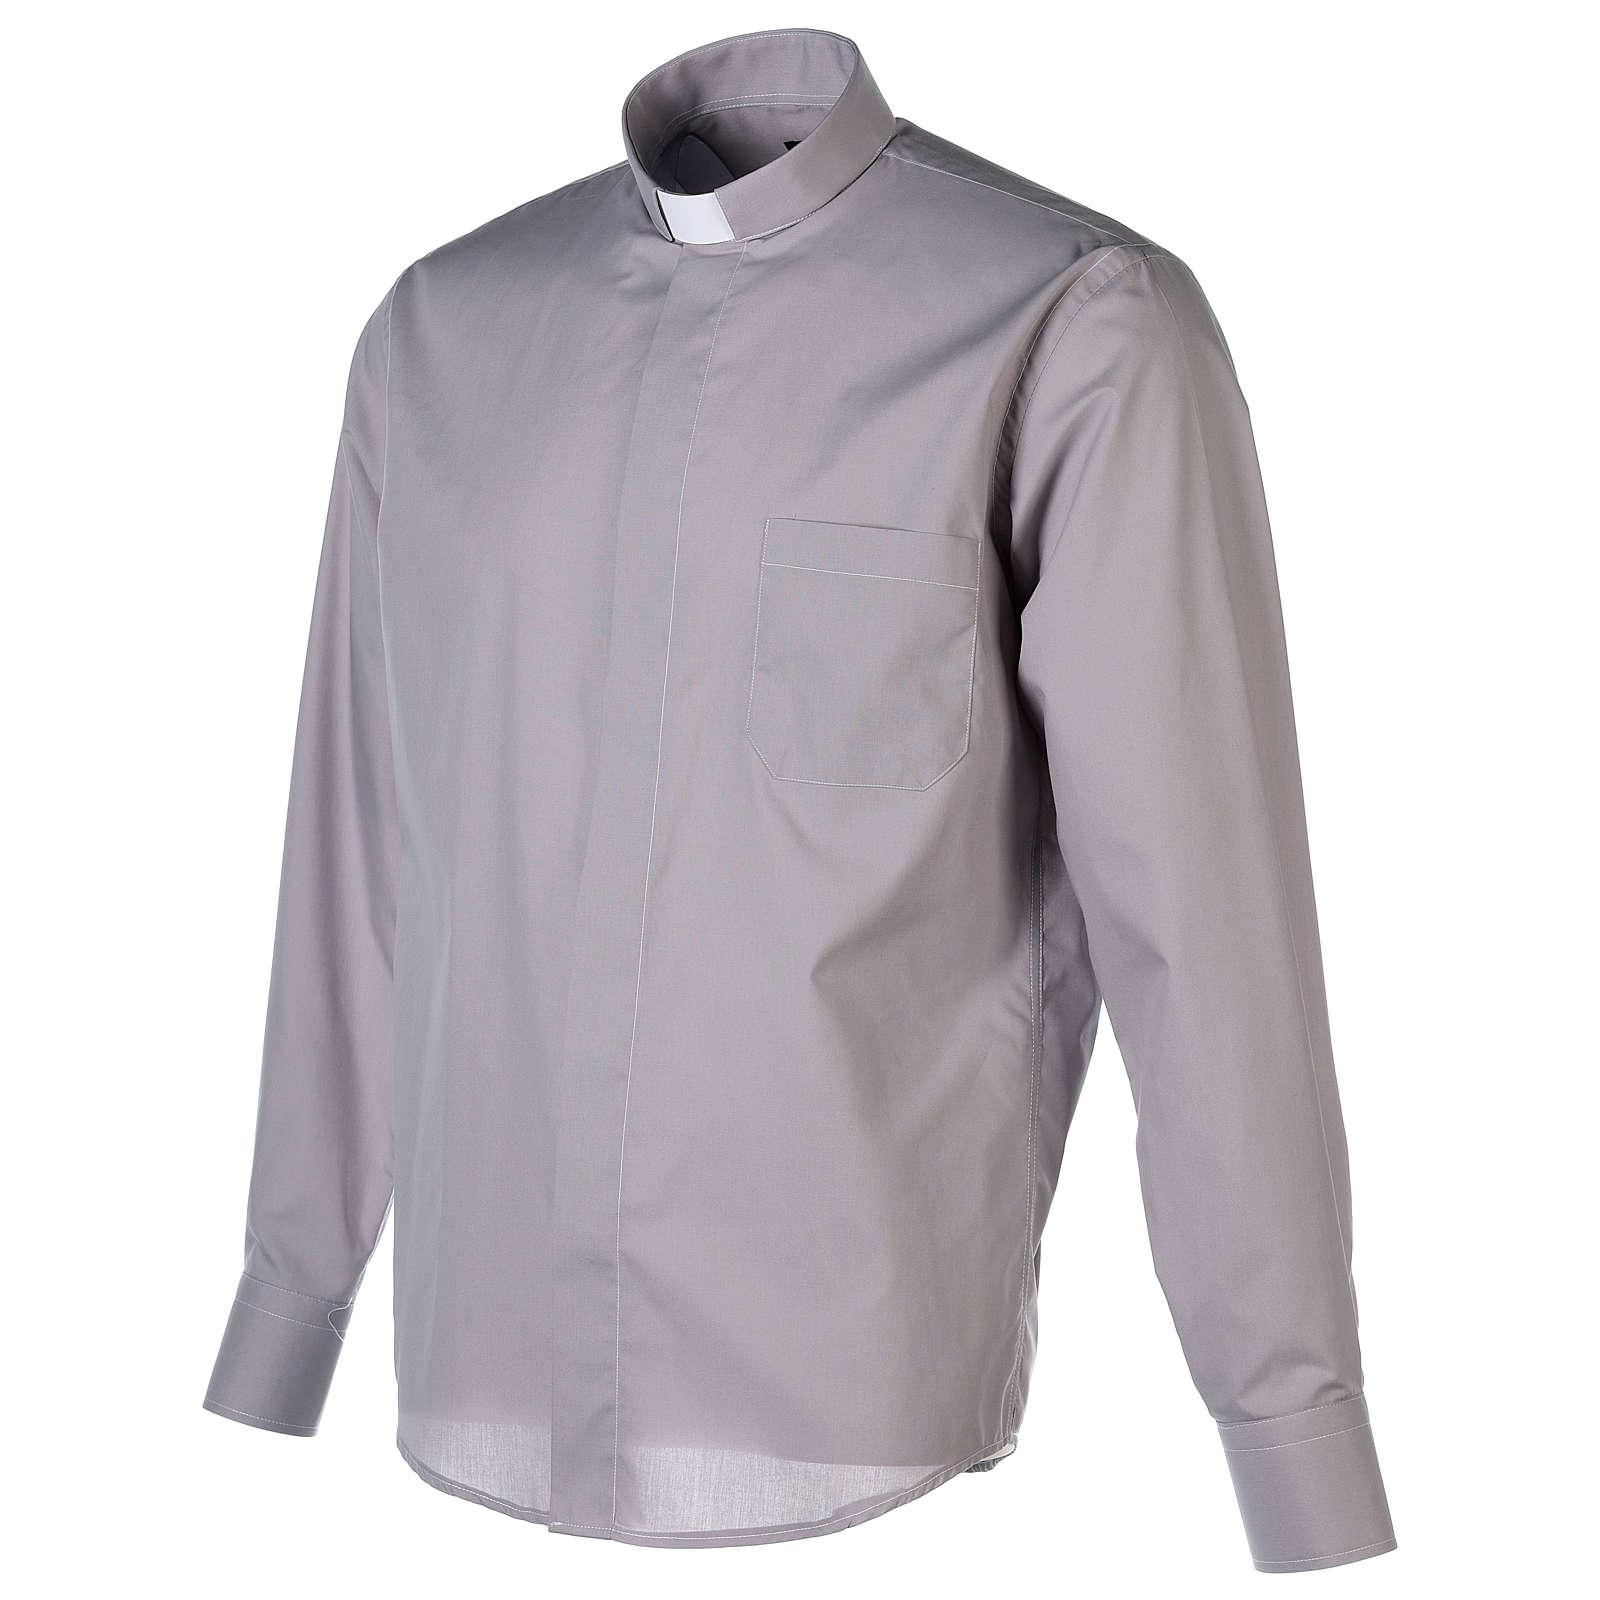 Camicia clergy M. Lunga tinta unita Misto cotone Grigio chiaro 4